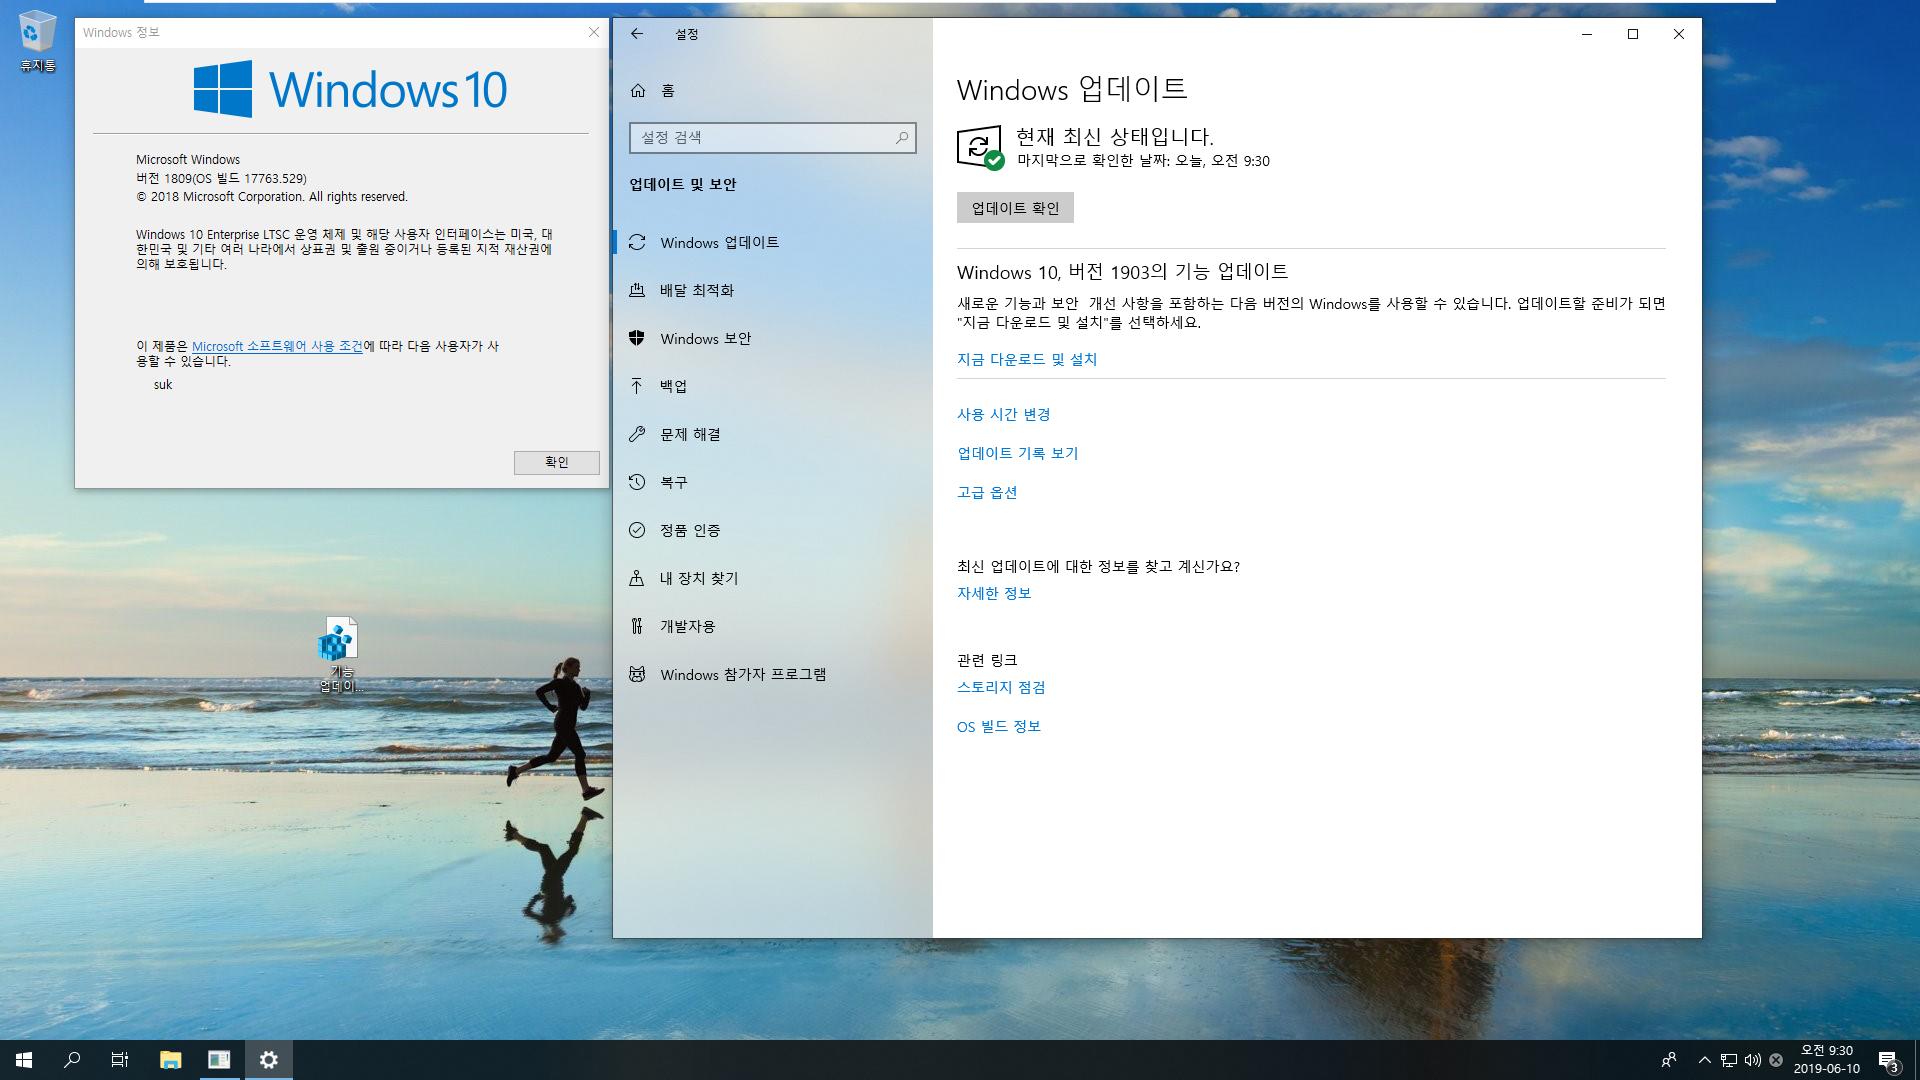 Windows 10 Enterprise LTSC [2019] - 버전 1809, 빌드 17763 - 버전 1903 기능 업데이트 테스트-MDL 사이트의 레지스트리 테스트 - 효과 없네요. 무시가 답입니다 2019-06-10_093028.png